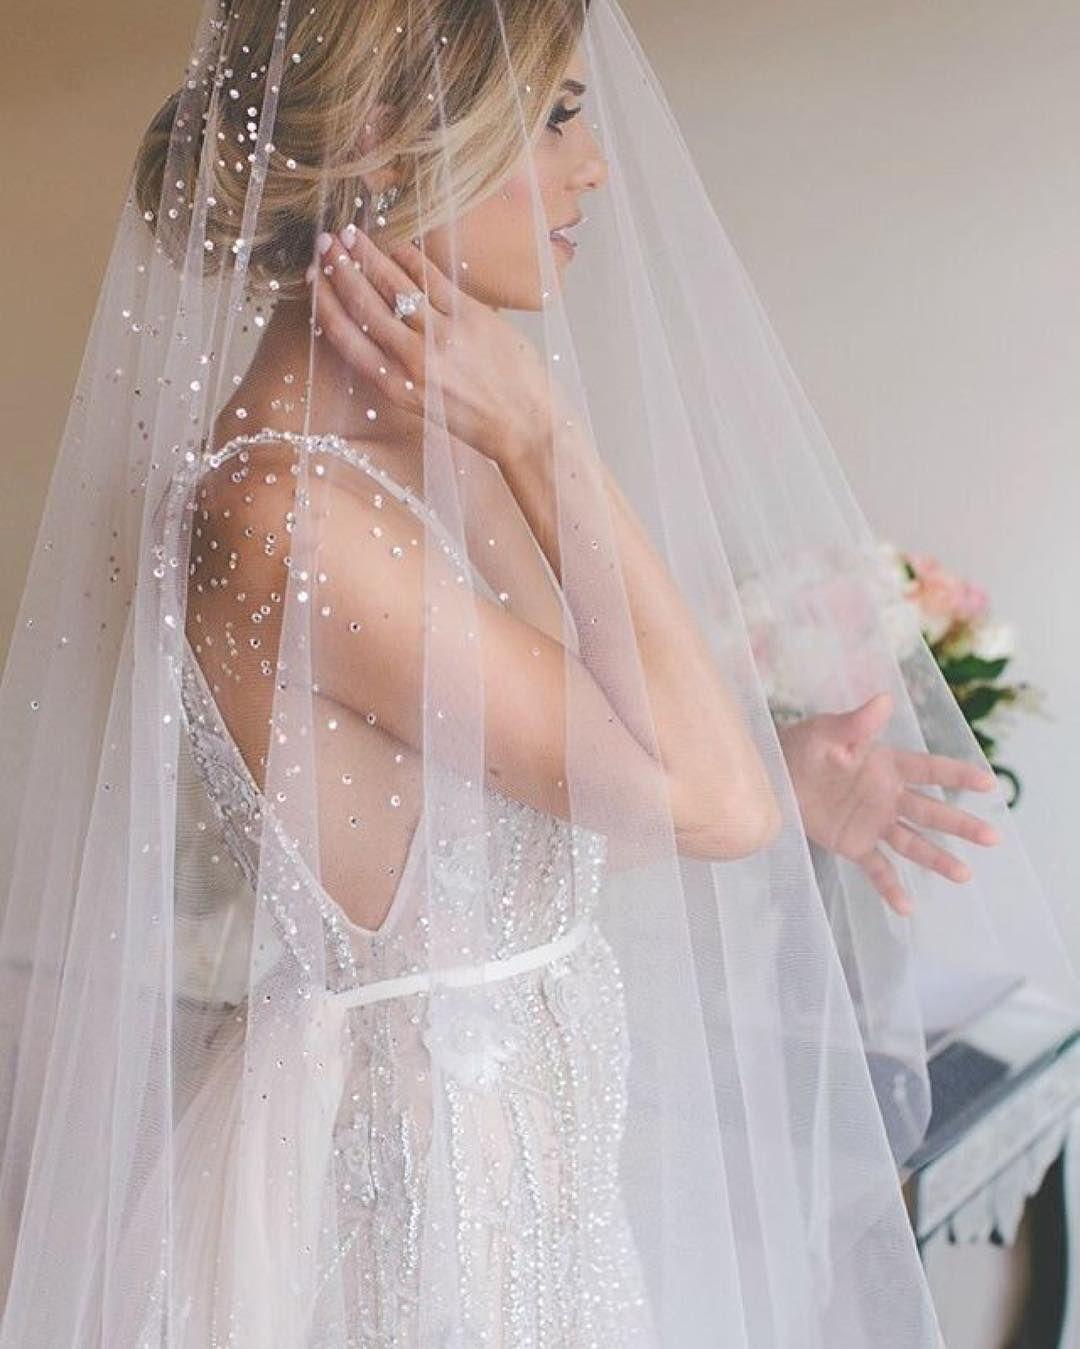 Pin By Salma Magdi On Bridal Woow Romantic Wedding Veil Beautiful Wedding Dresses Bride